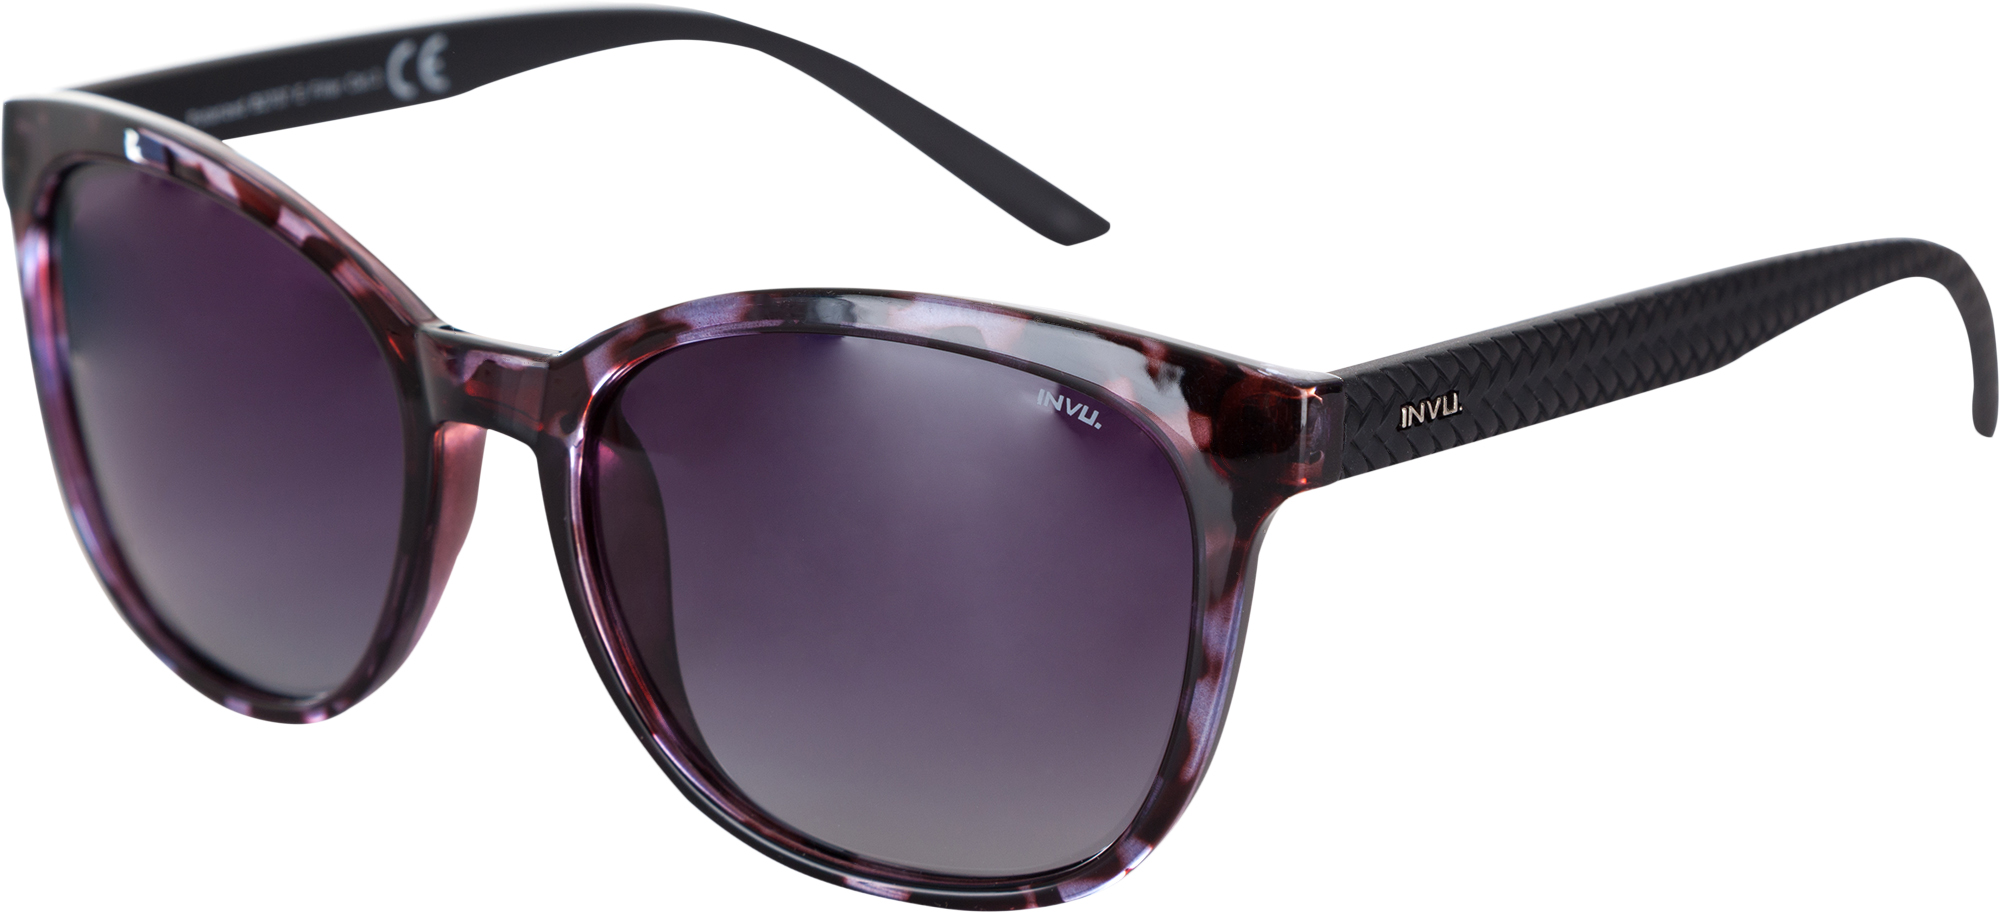 Invu Солнцезащитные очки женские Invu солнцезащитные очки bikkembergs очки солнцезащитные